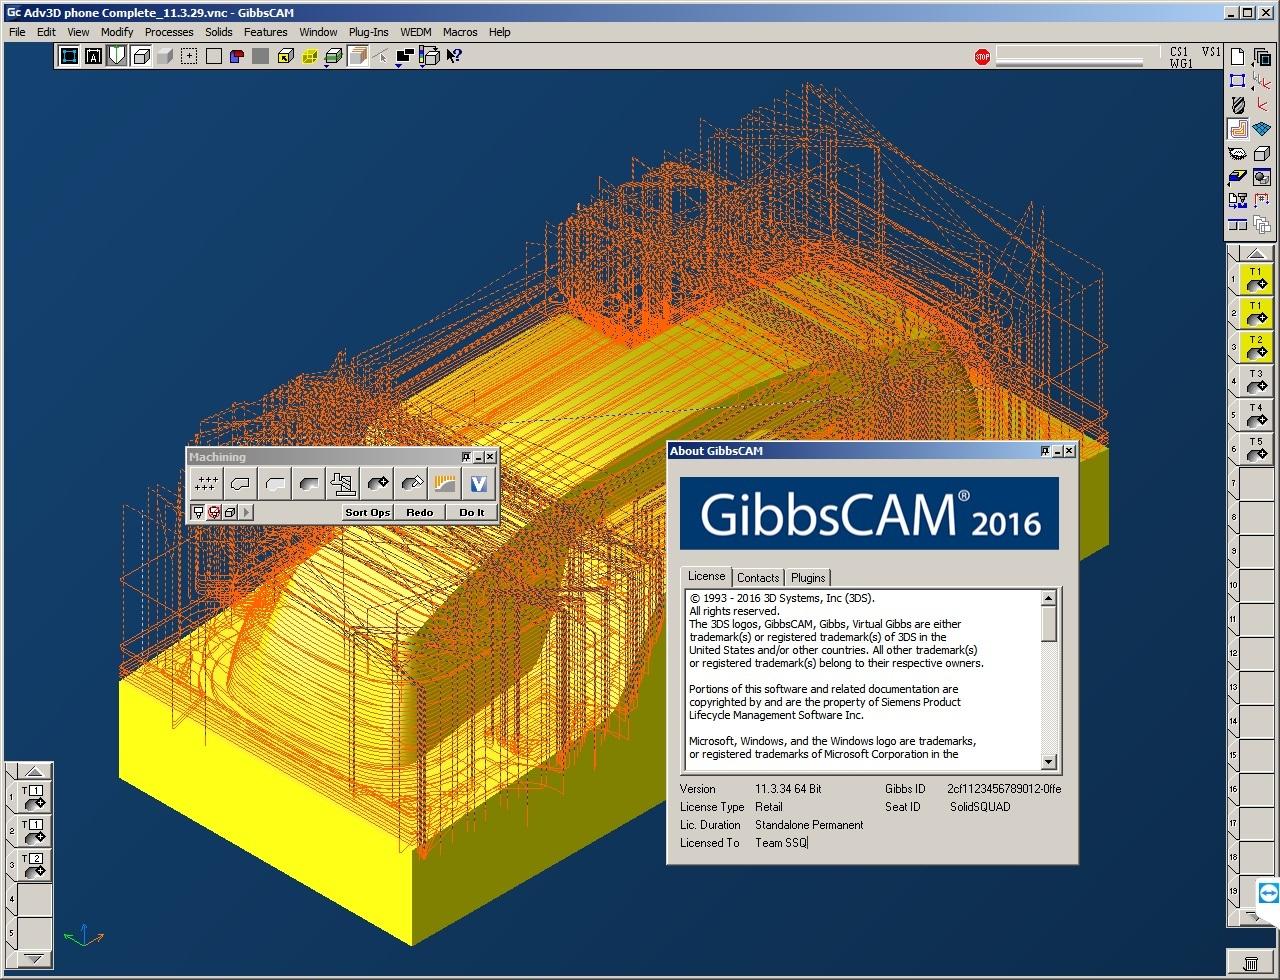 Machining with GibbsCAM 2016 v11.3.27.0 full license